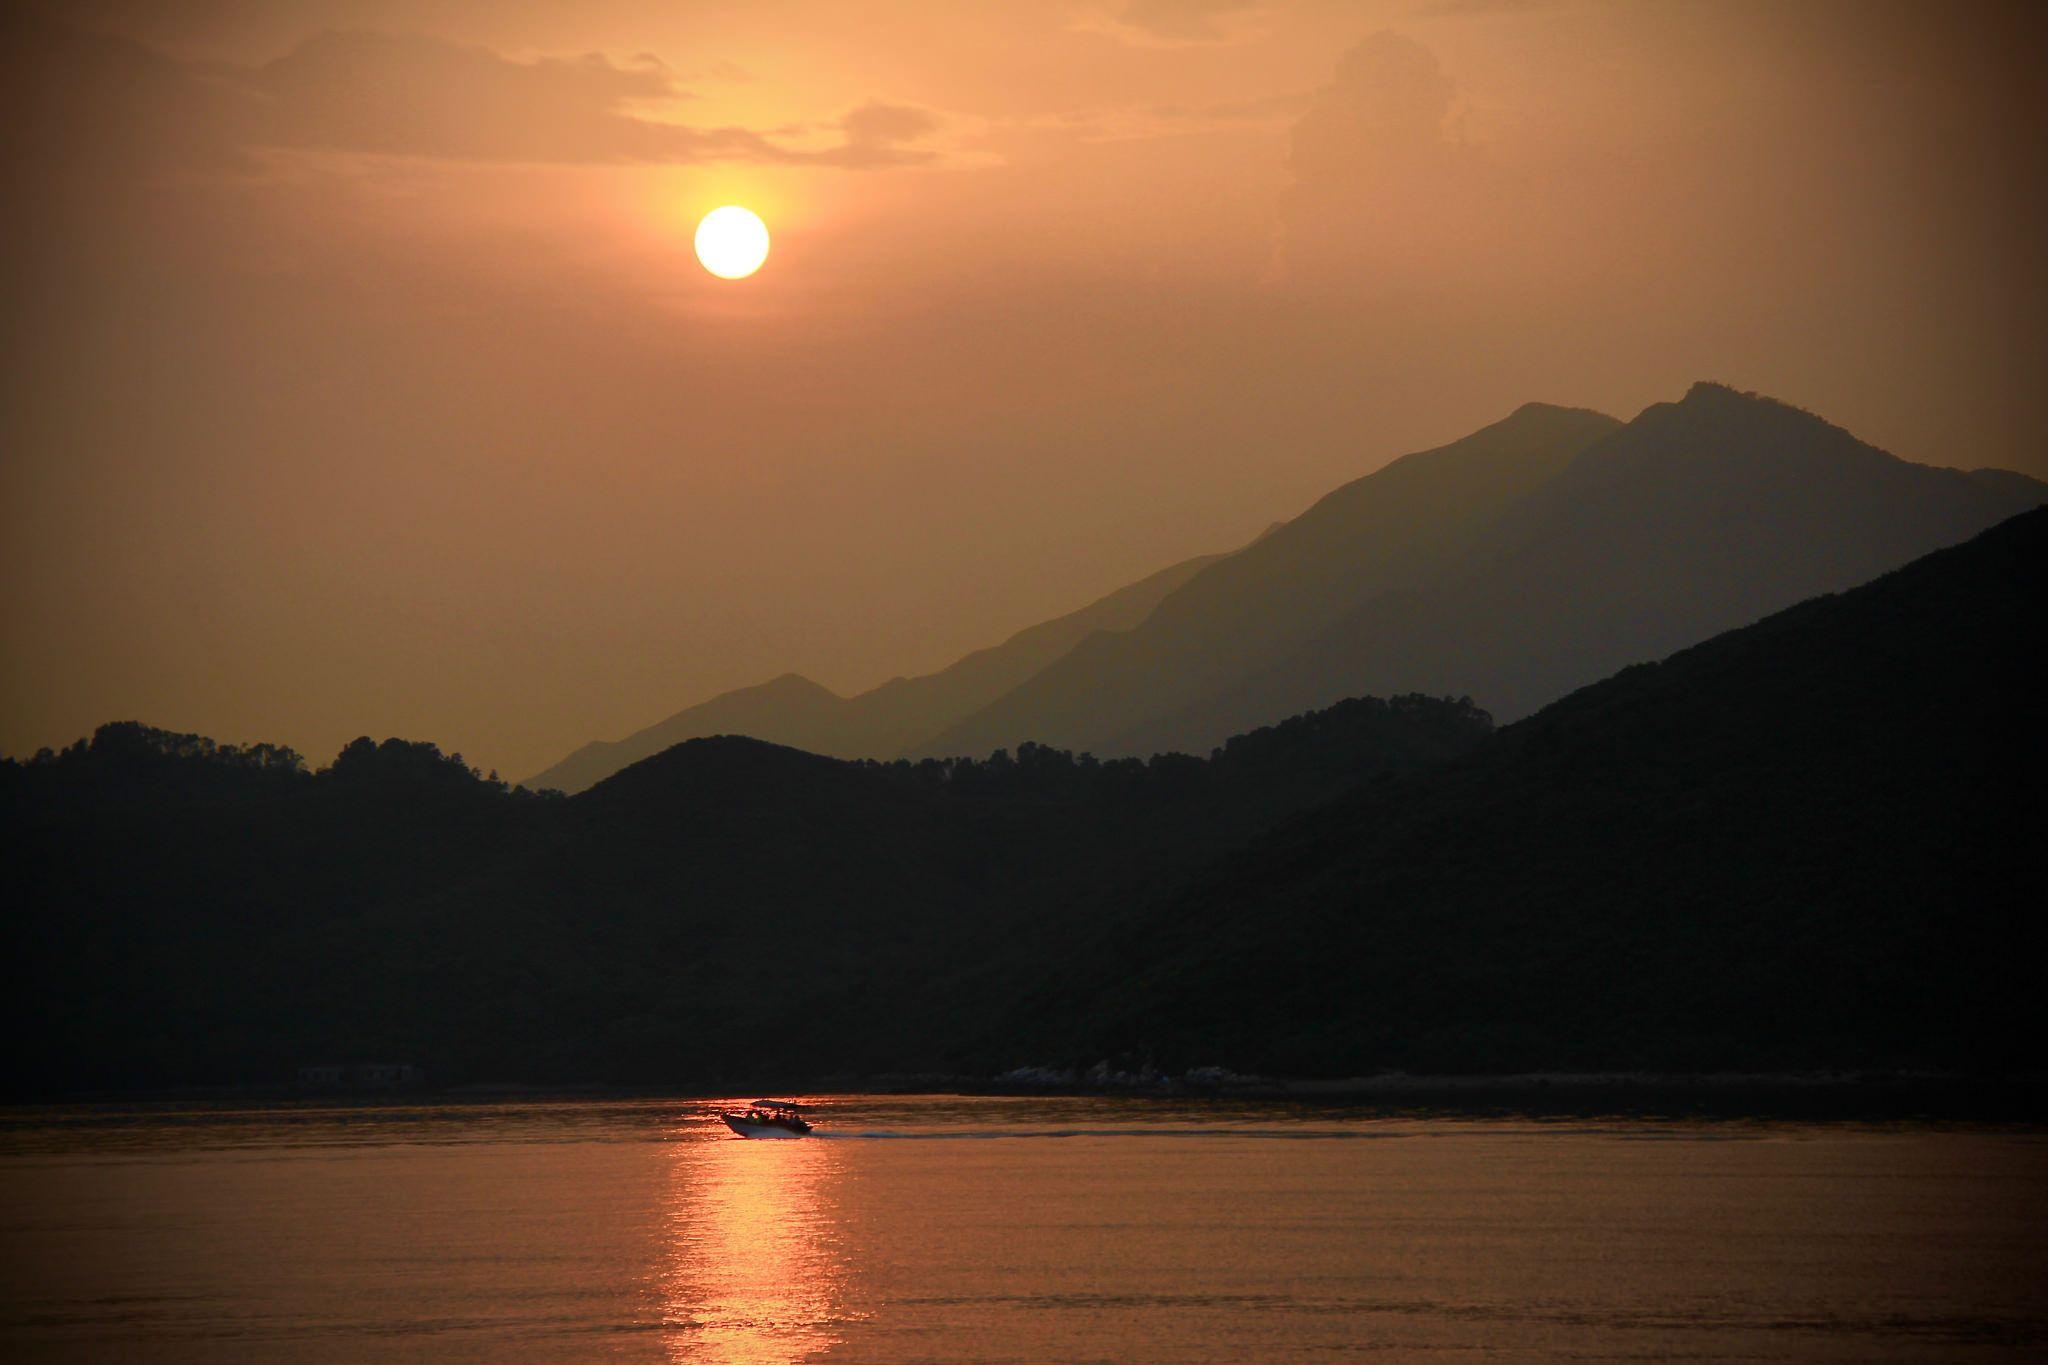 https://flic.kr/p/Pqjv3o   Sunset at East Peng Chu   Sunset at Geopark island East Peng Chu. a volcanic island with rare rocks.